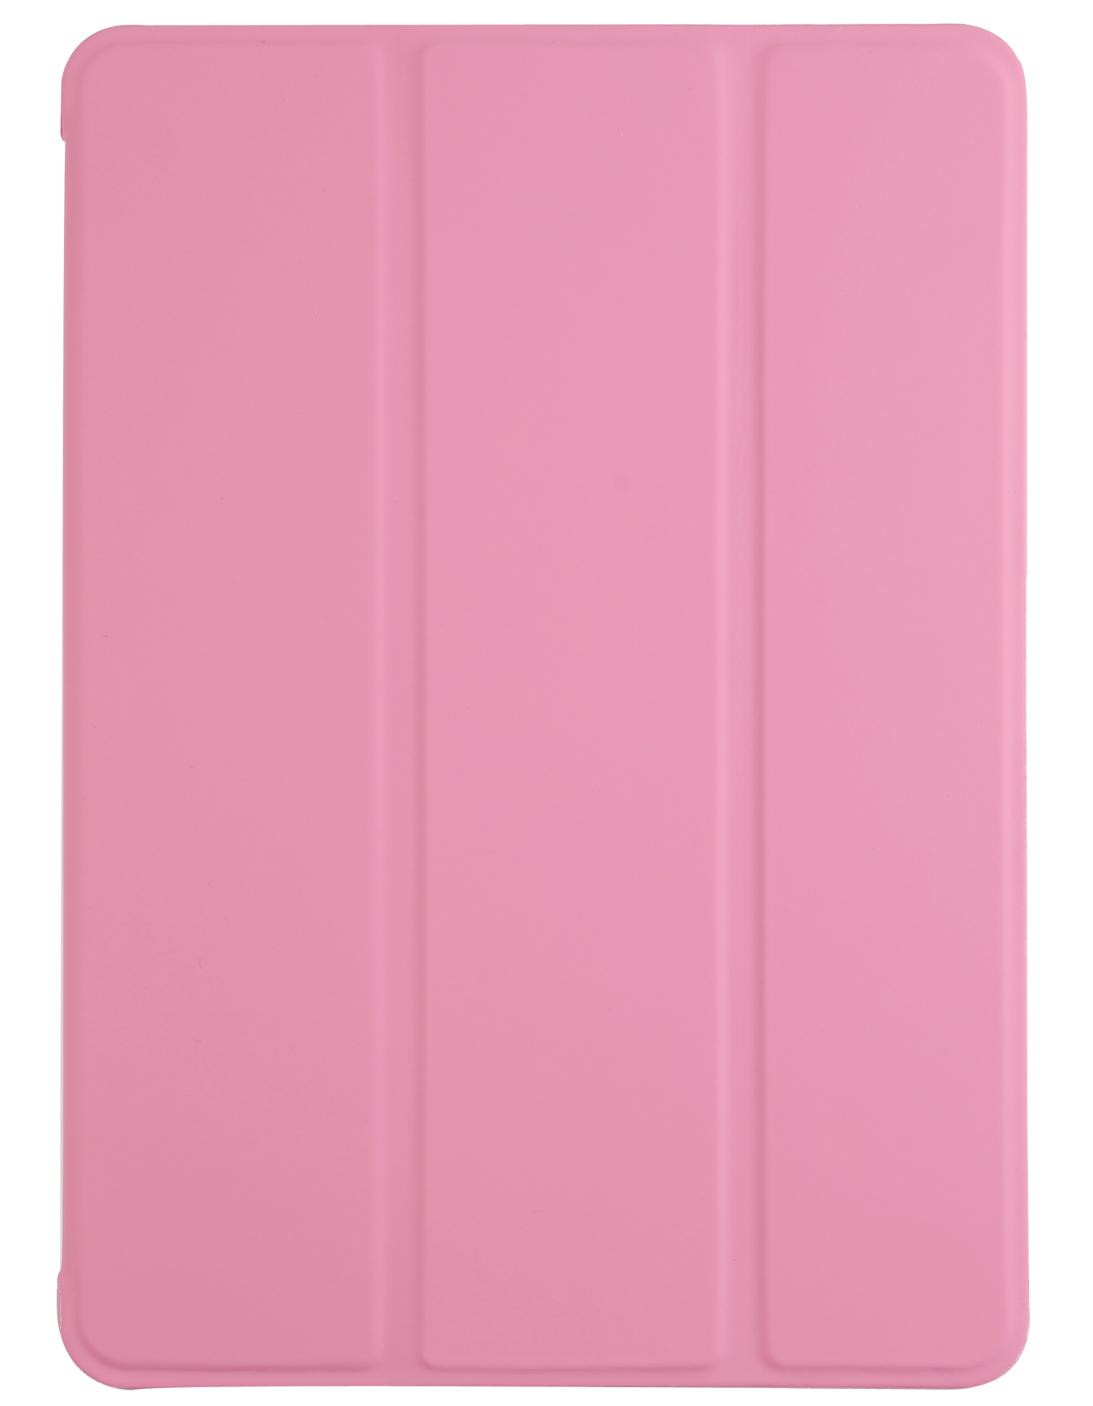 original-skech-case-flipper-ipad-mini-4-pink-retail